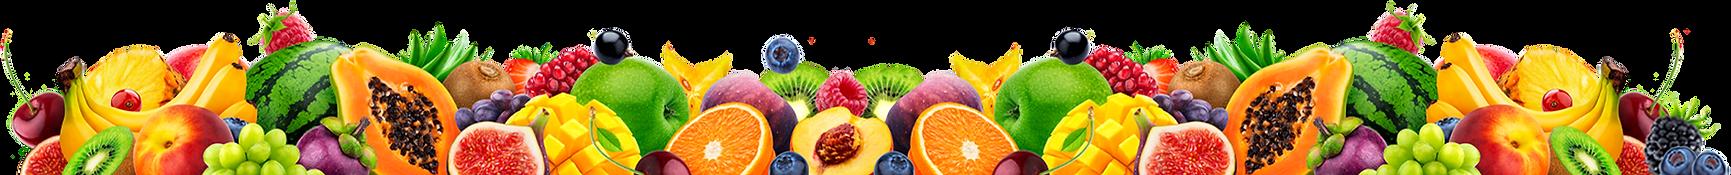 FruitBanner.png